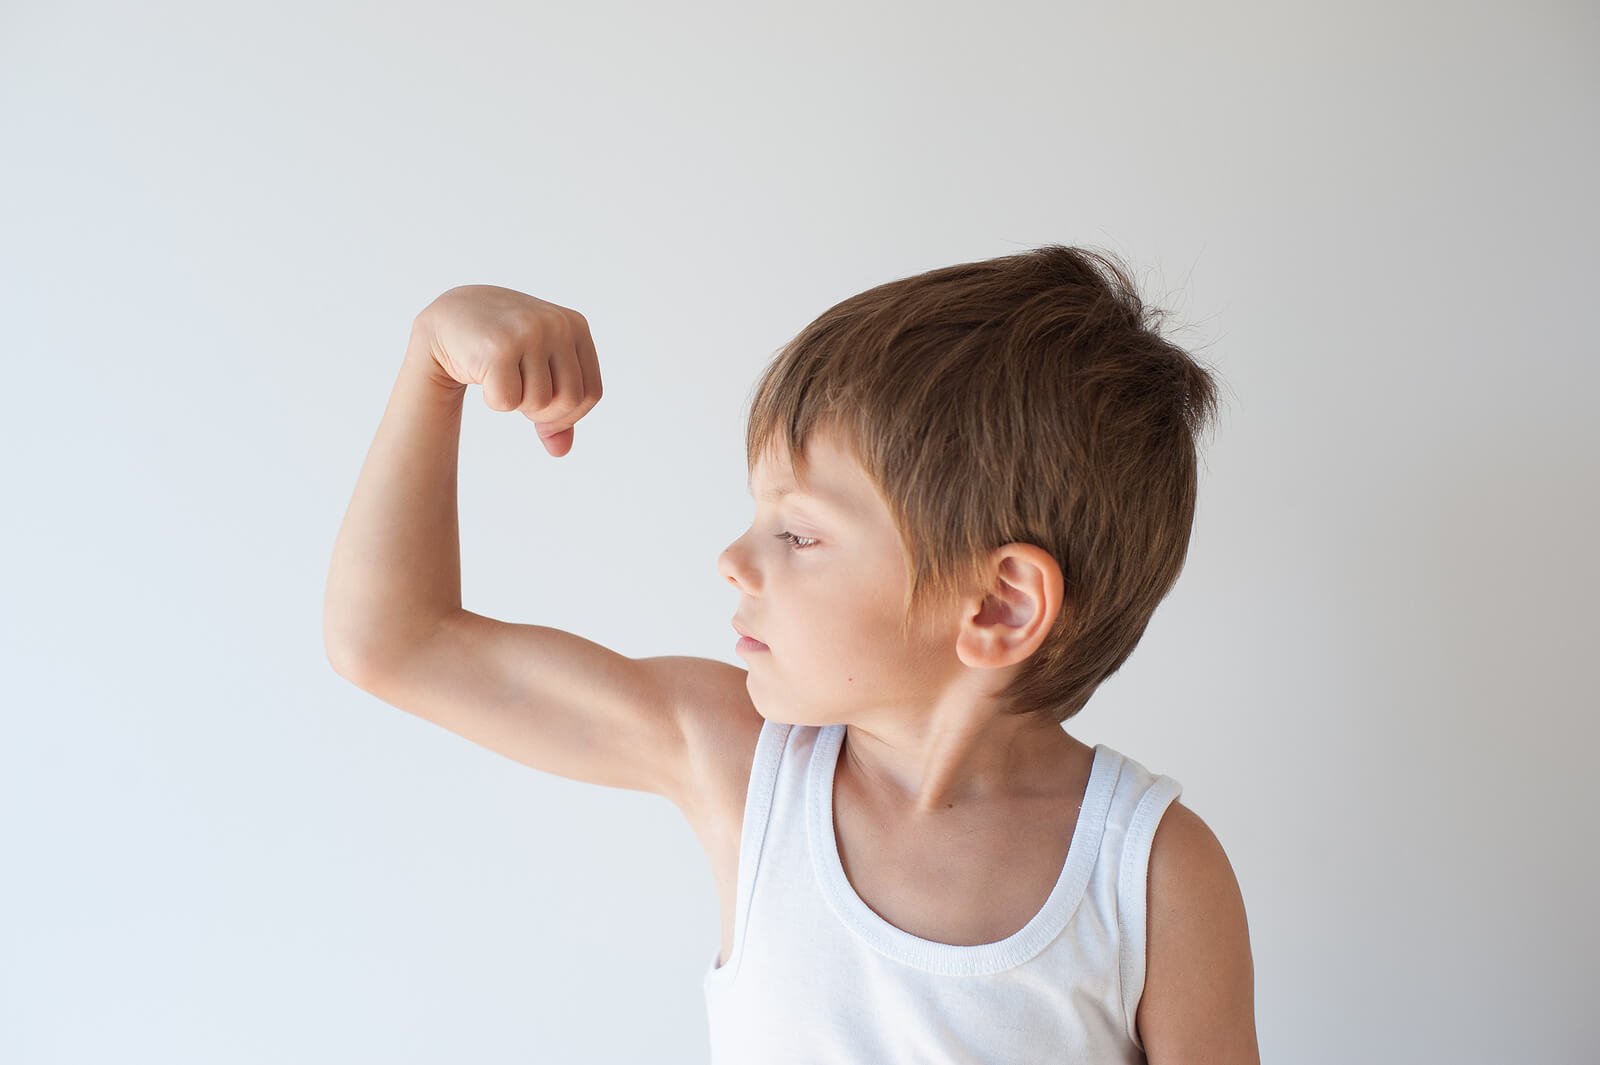 Niño enseñando su fortaleza.